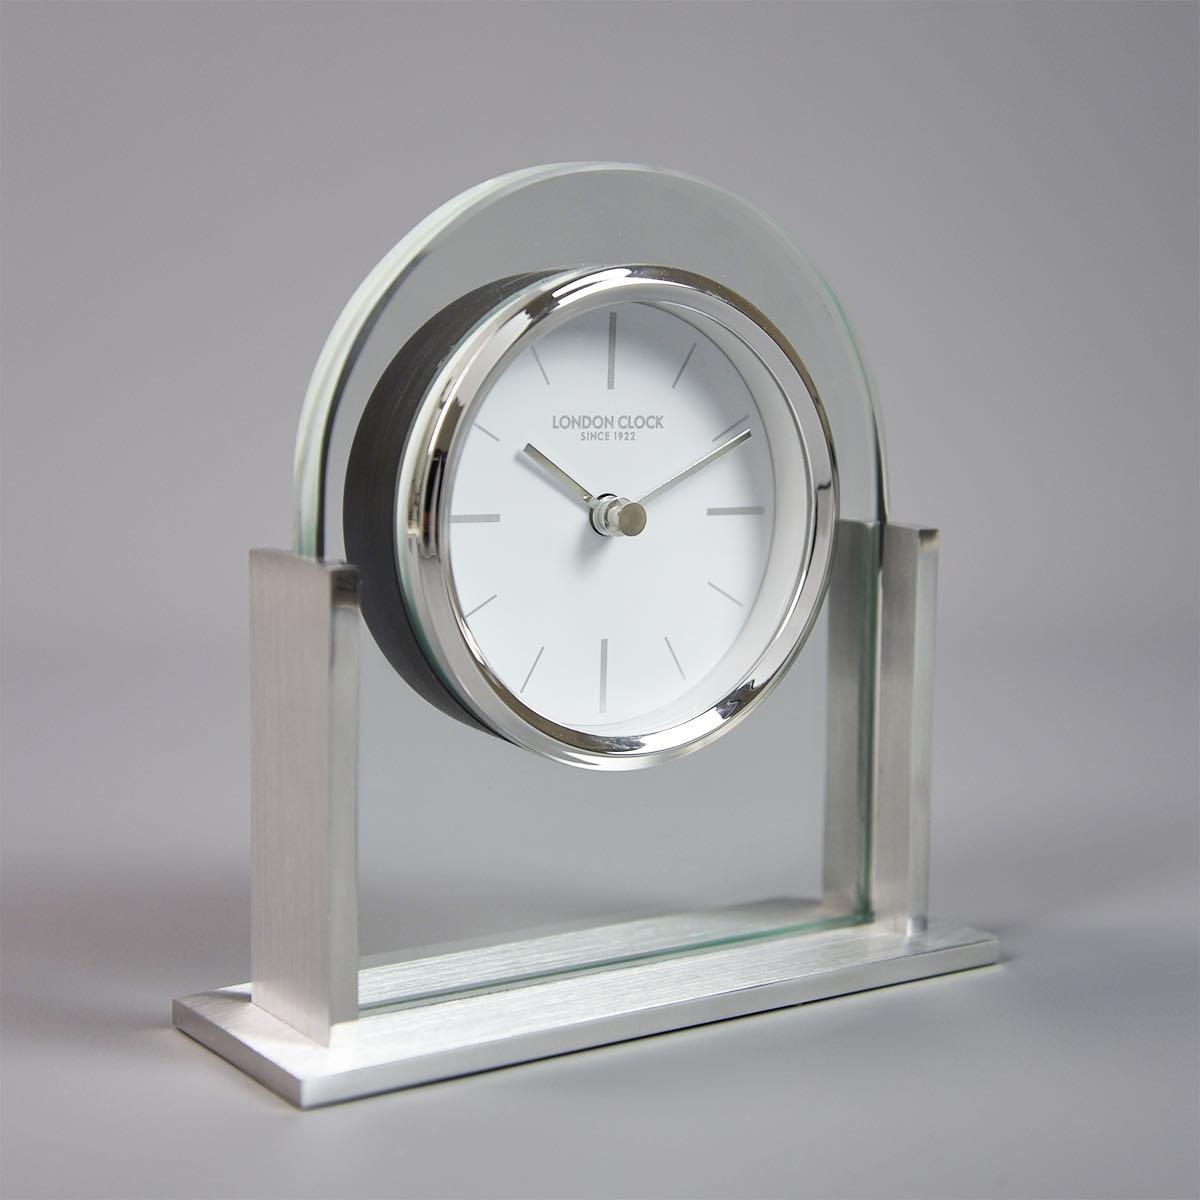 London Clock Magnum Mantel, silberfarben, 14,5 x 14,5 x 5 cm